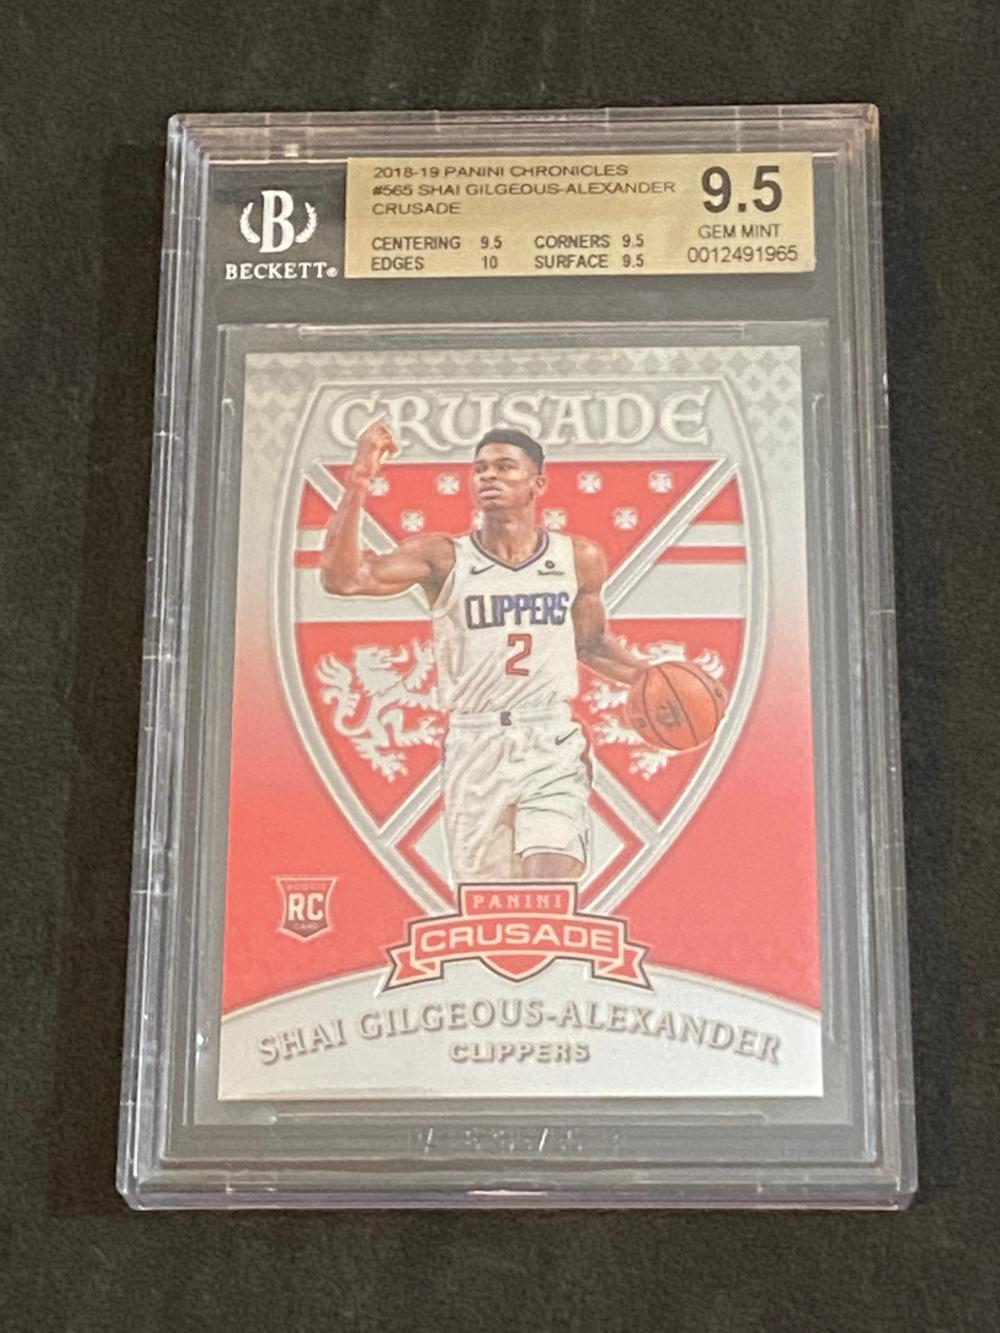 Beckett 9.5 (Gem Mint) 2018-19 Panini Chronicles RC Crusade Shai Gilgeous-Alexander Rookie #565 Basketball Card